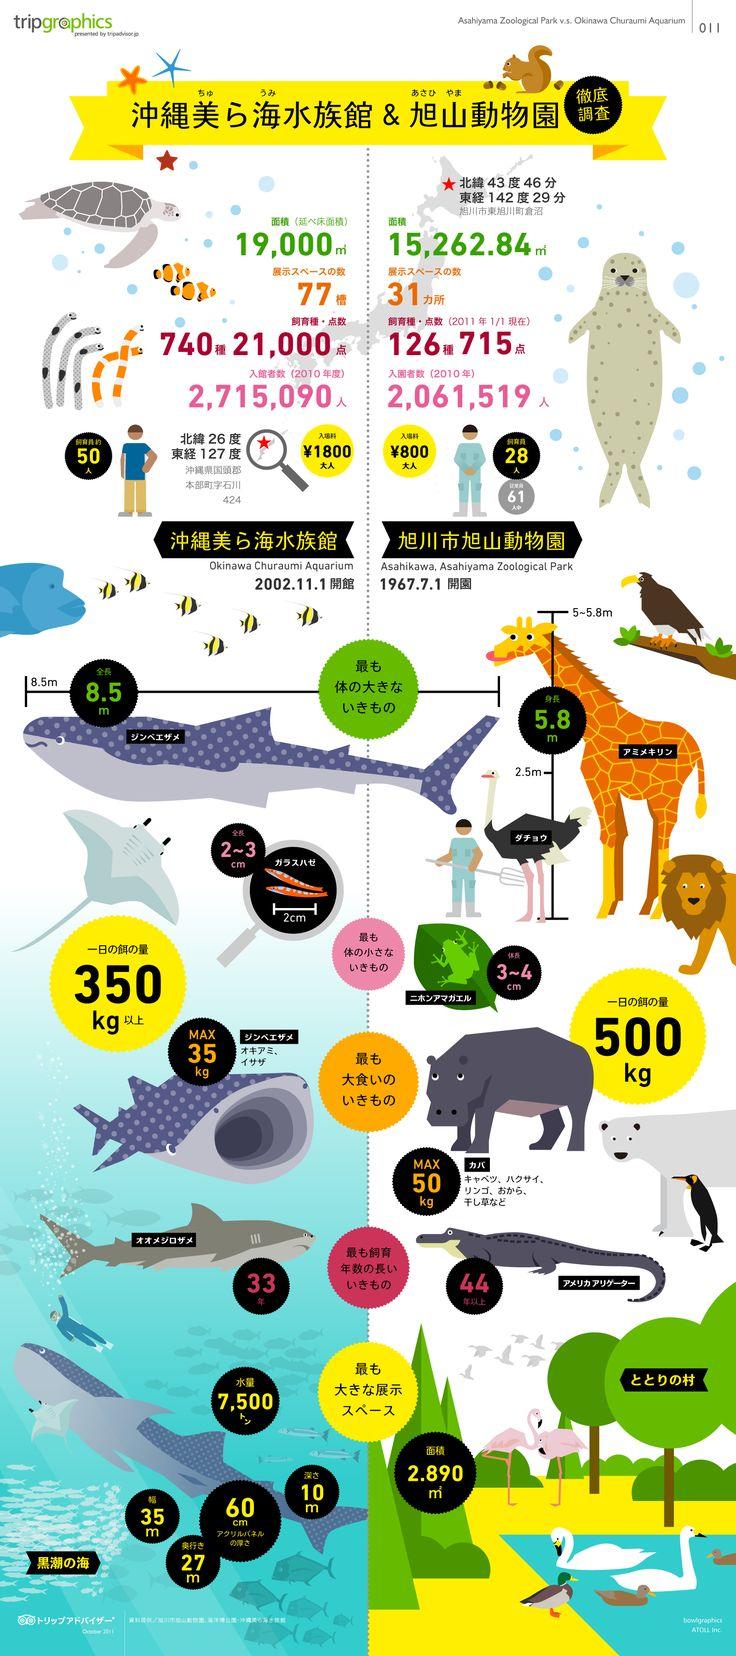 Okinawa Churaumi Aquarium v.s. Asahiyama Zoological Park